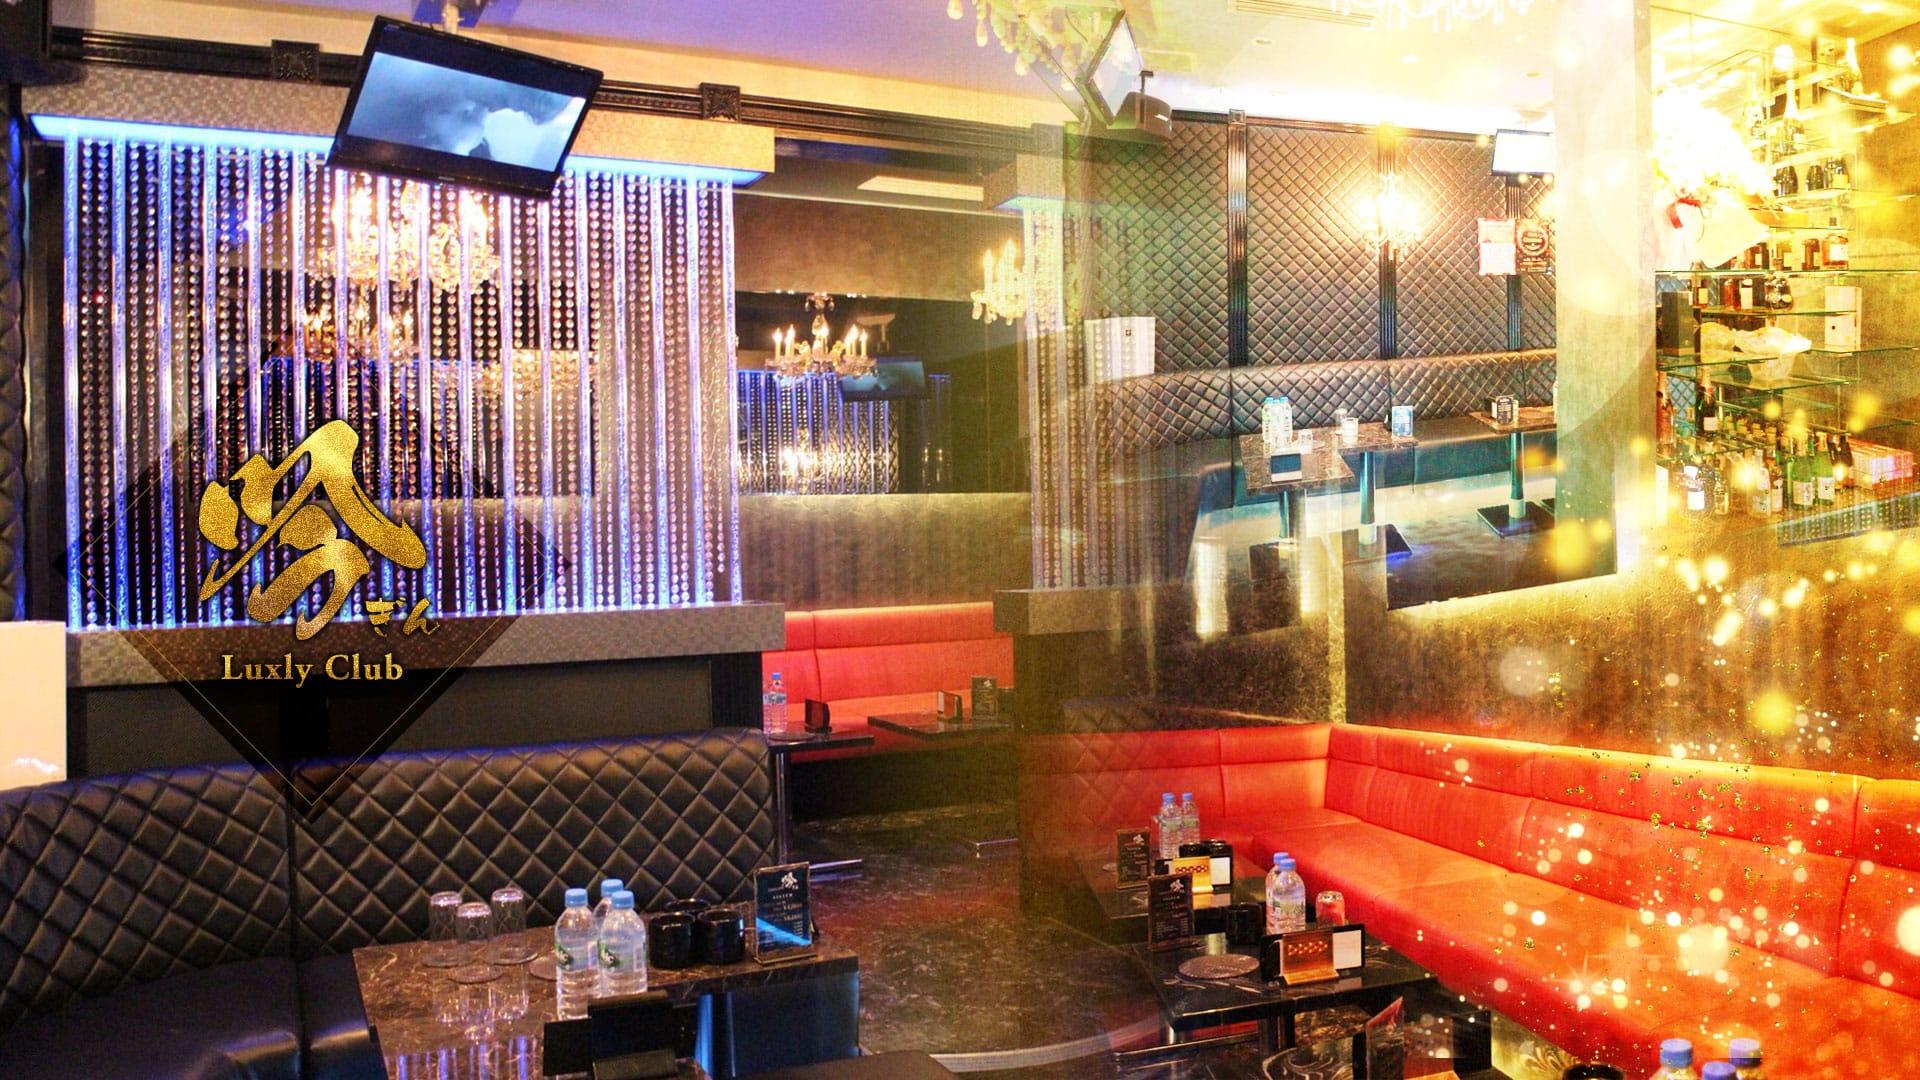 Luxly Club 吟[ギン] 新橋 キャバクラ TOP画像